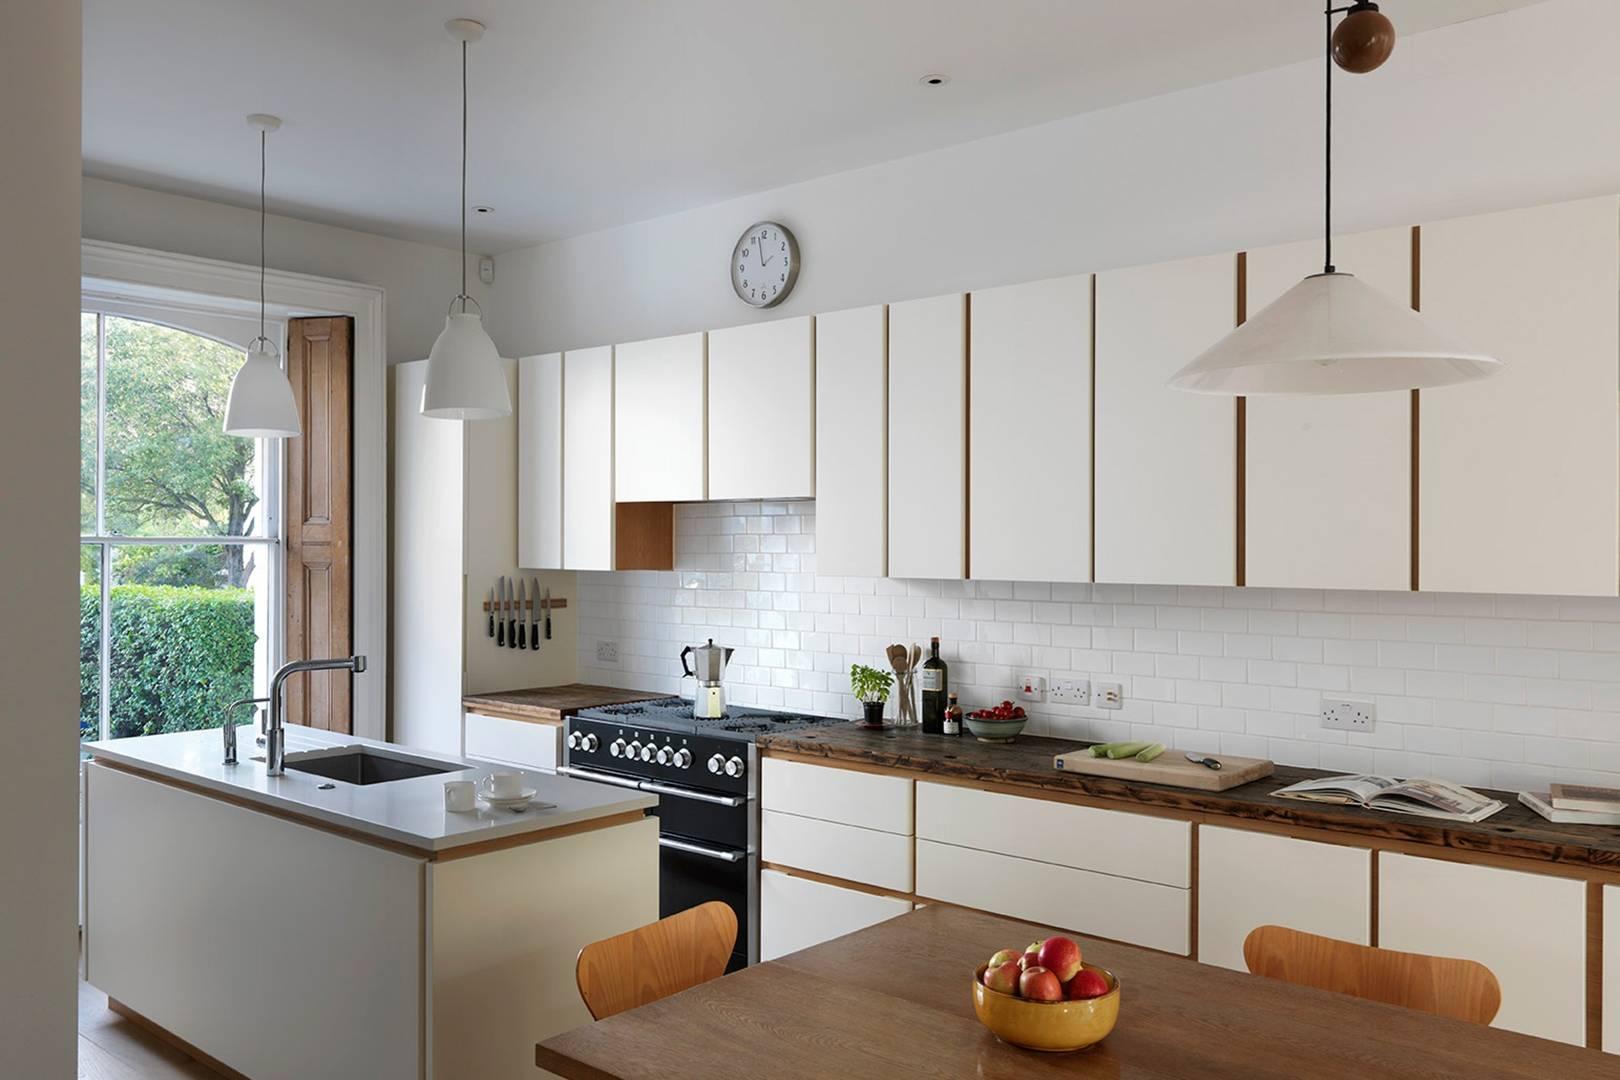 Modern White Narrow Kitchen - Kitchen Design Ideas   House & Garden